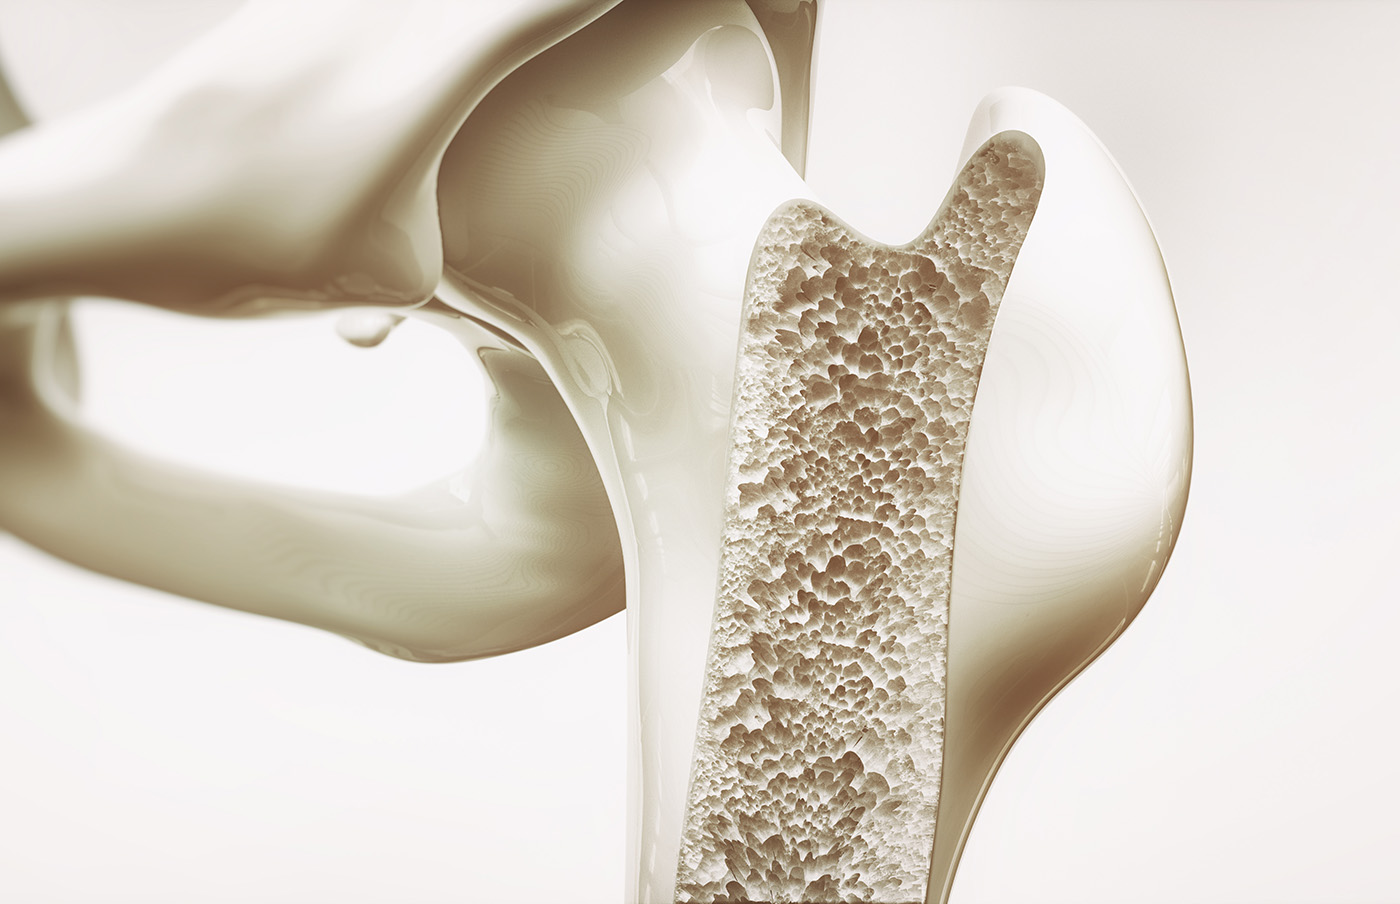 Demineralised Bone Matrix